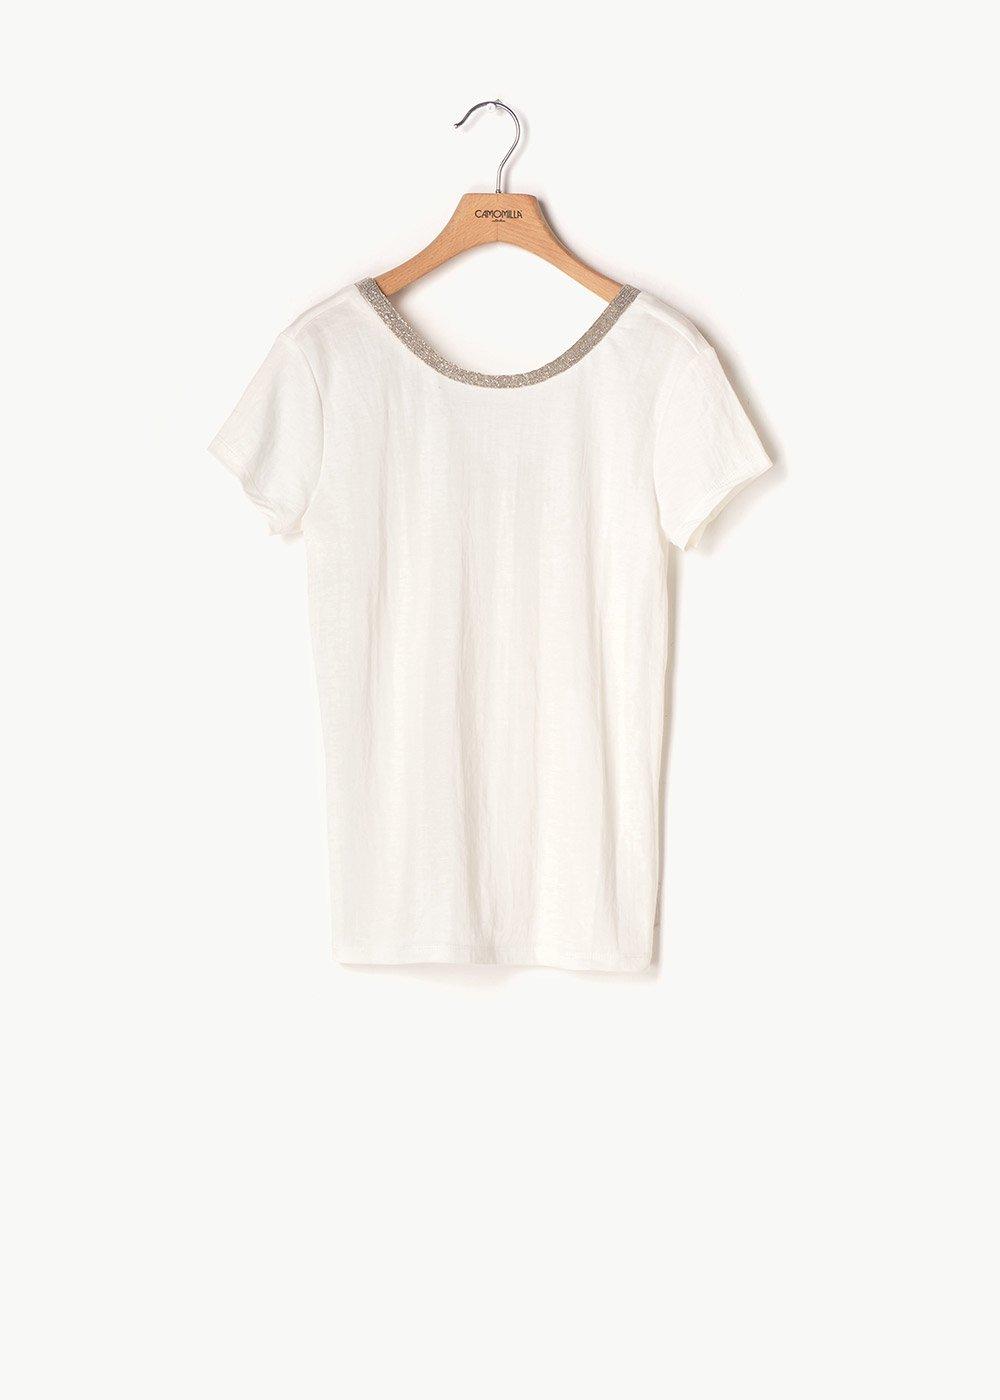 T-shirt Sael scollo tondo - White - Donna